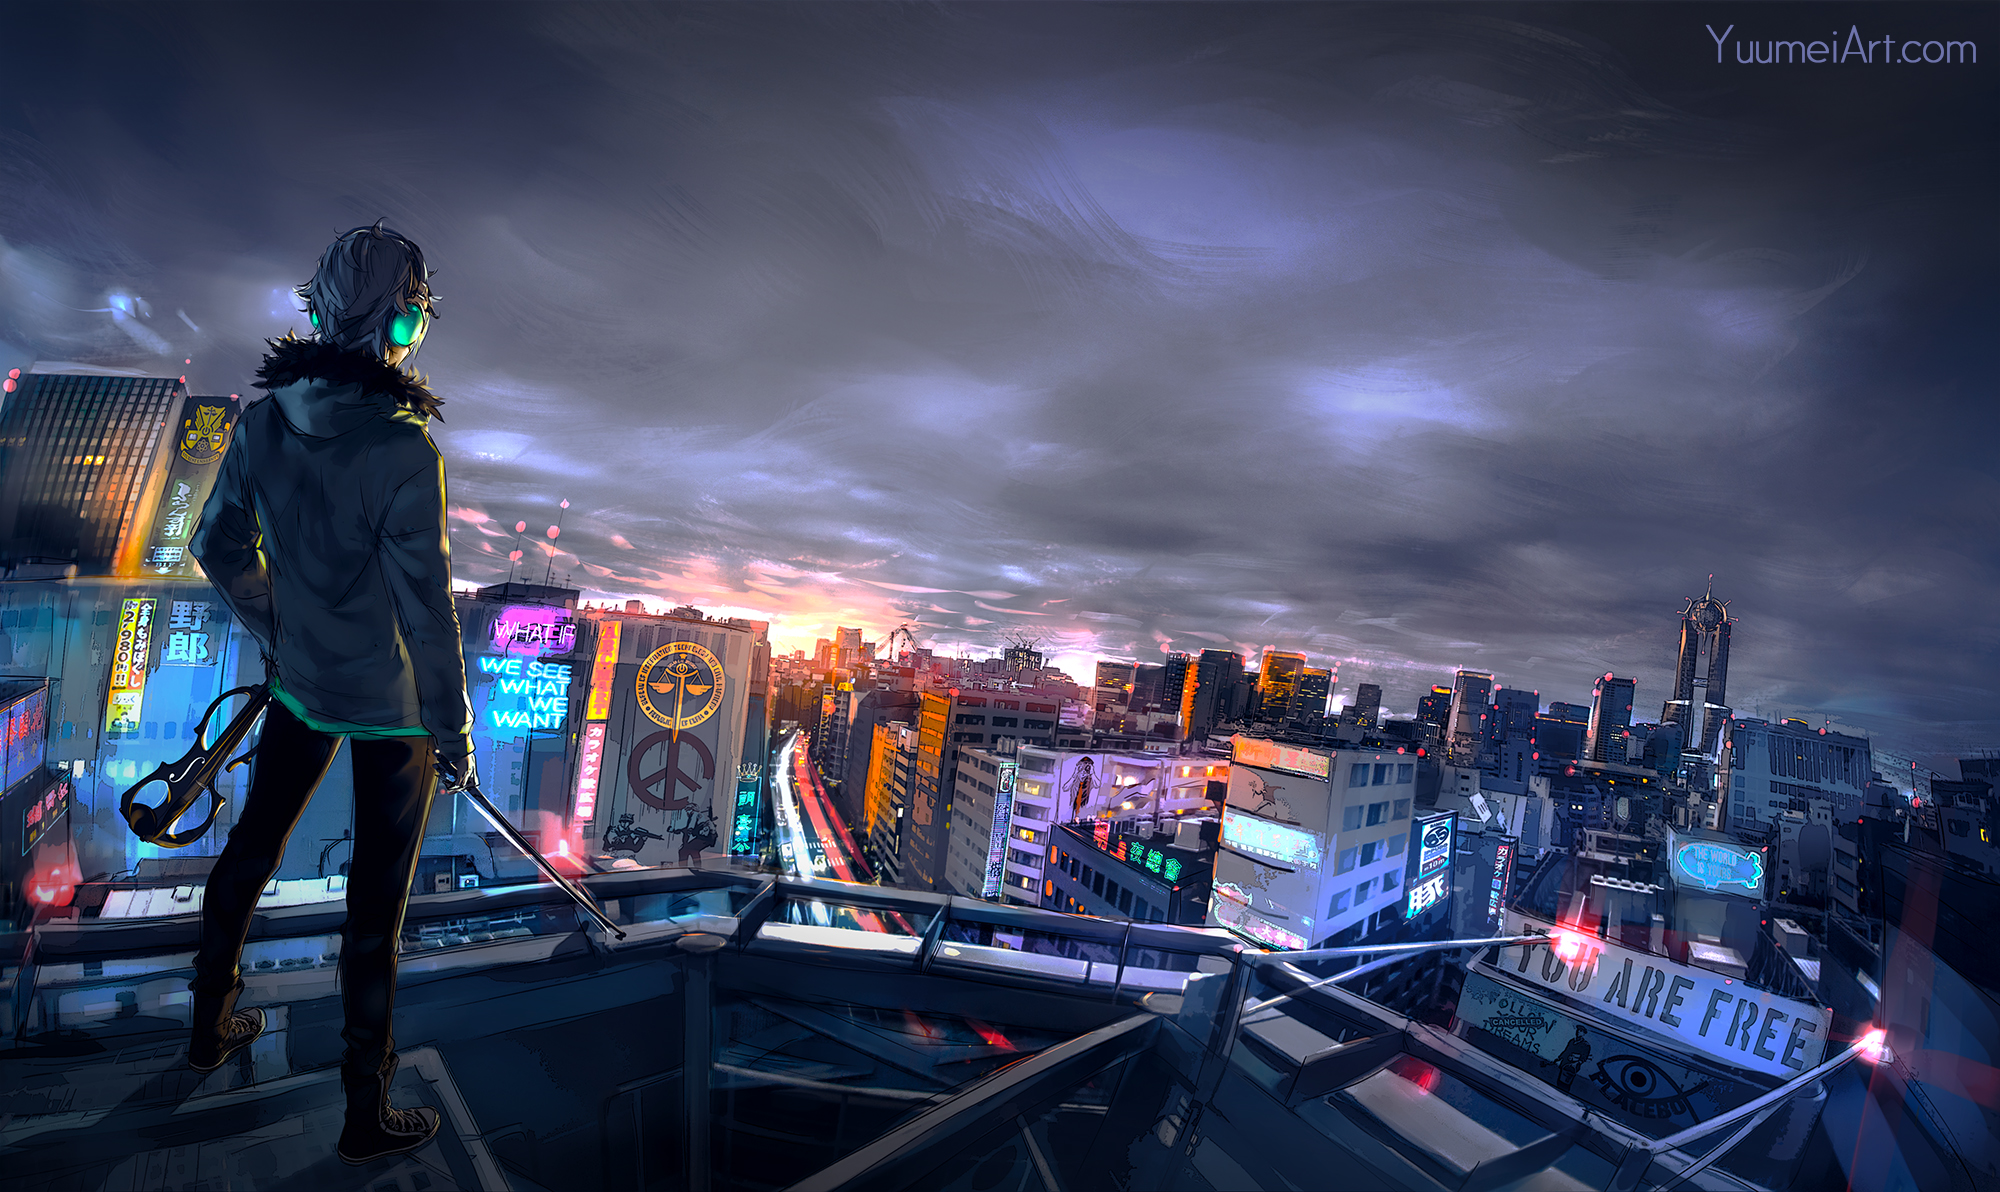 Cute Apartment Cyberpunk Cityscape Hd Artist 4k Wallpapers Images